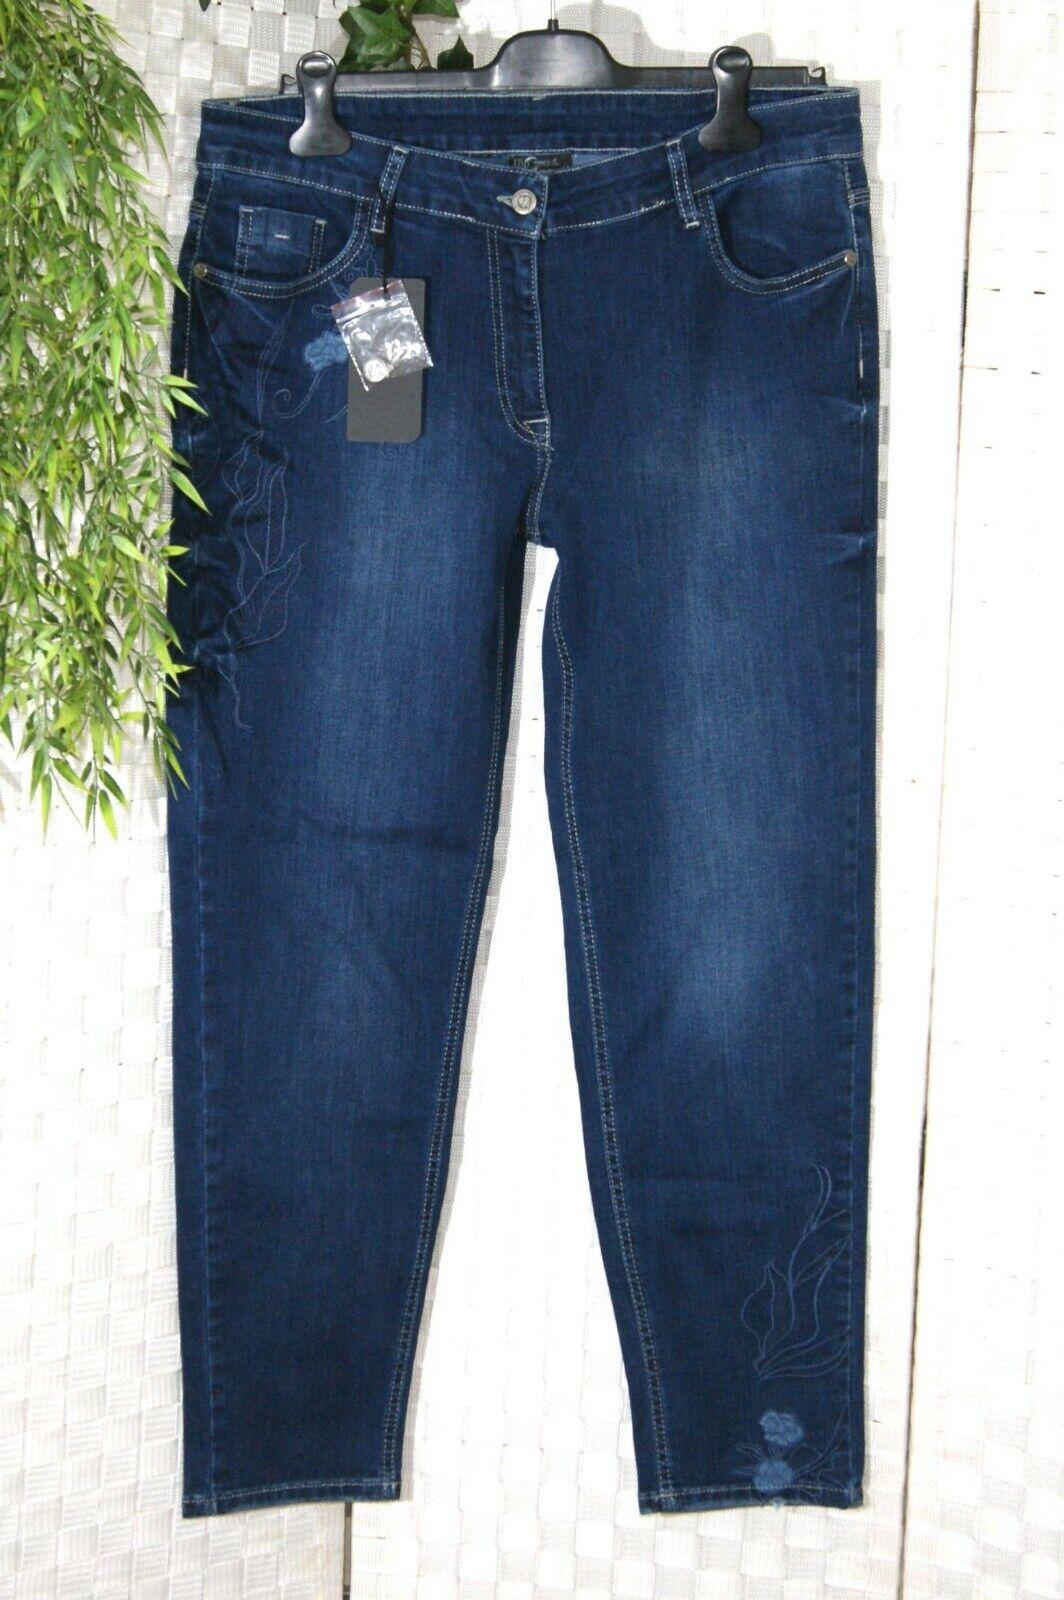 NEU TOP SECRET Damen Jeans Hose 44 46 48 blau Blaumen Stickerei STRETCH User